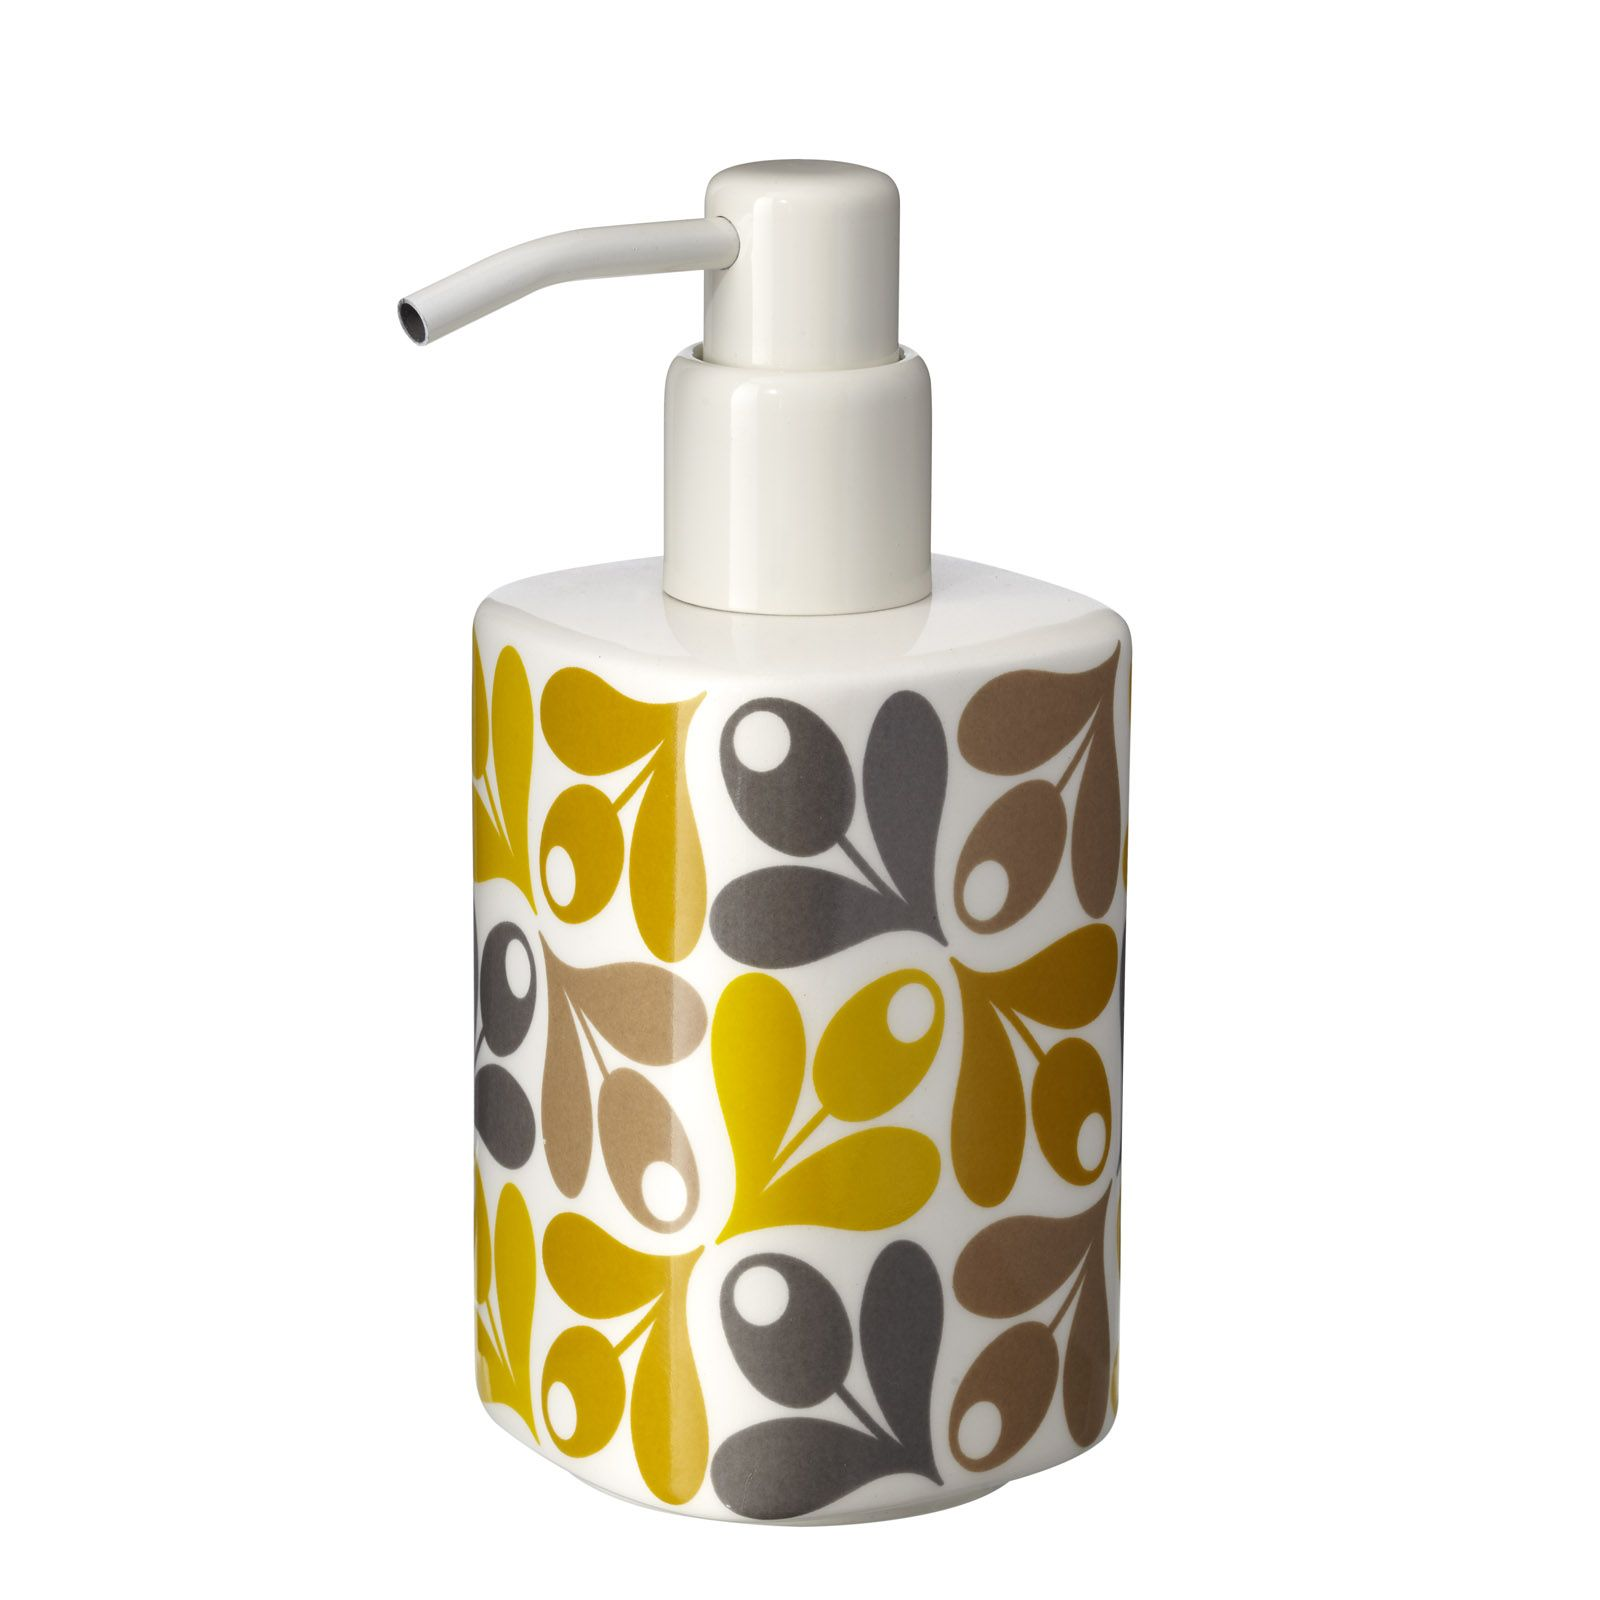 Acorn bathroom furniture - Acorn Cup Soap Dispenser